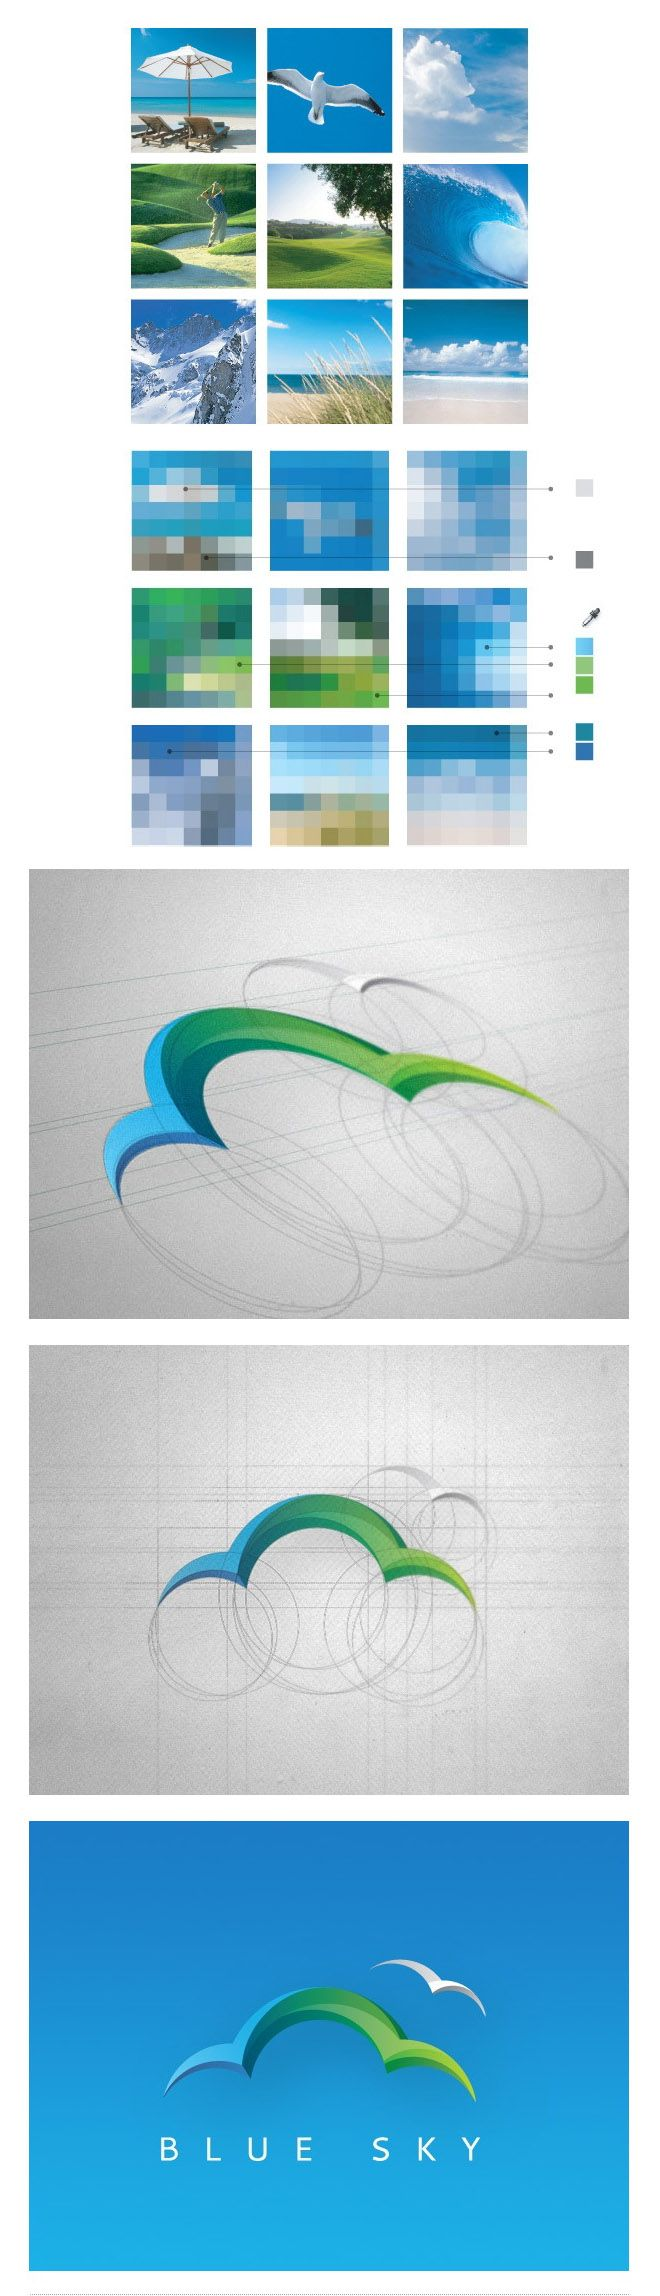 35 Creative and Beautiful Branding Identity Design examples